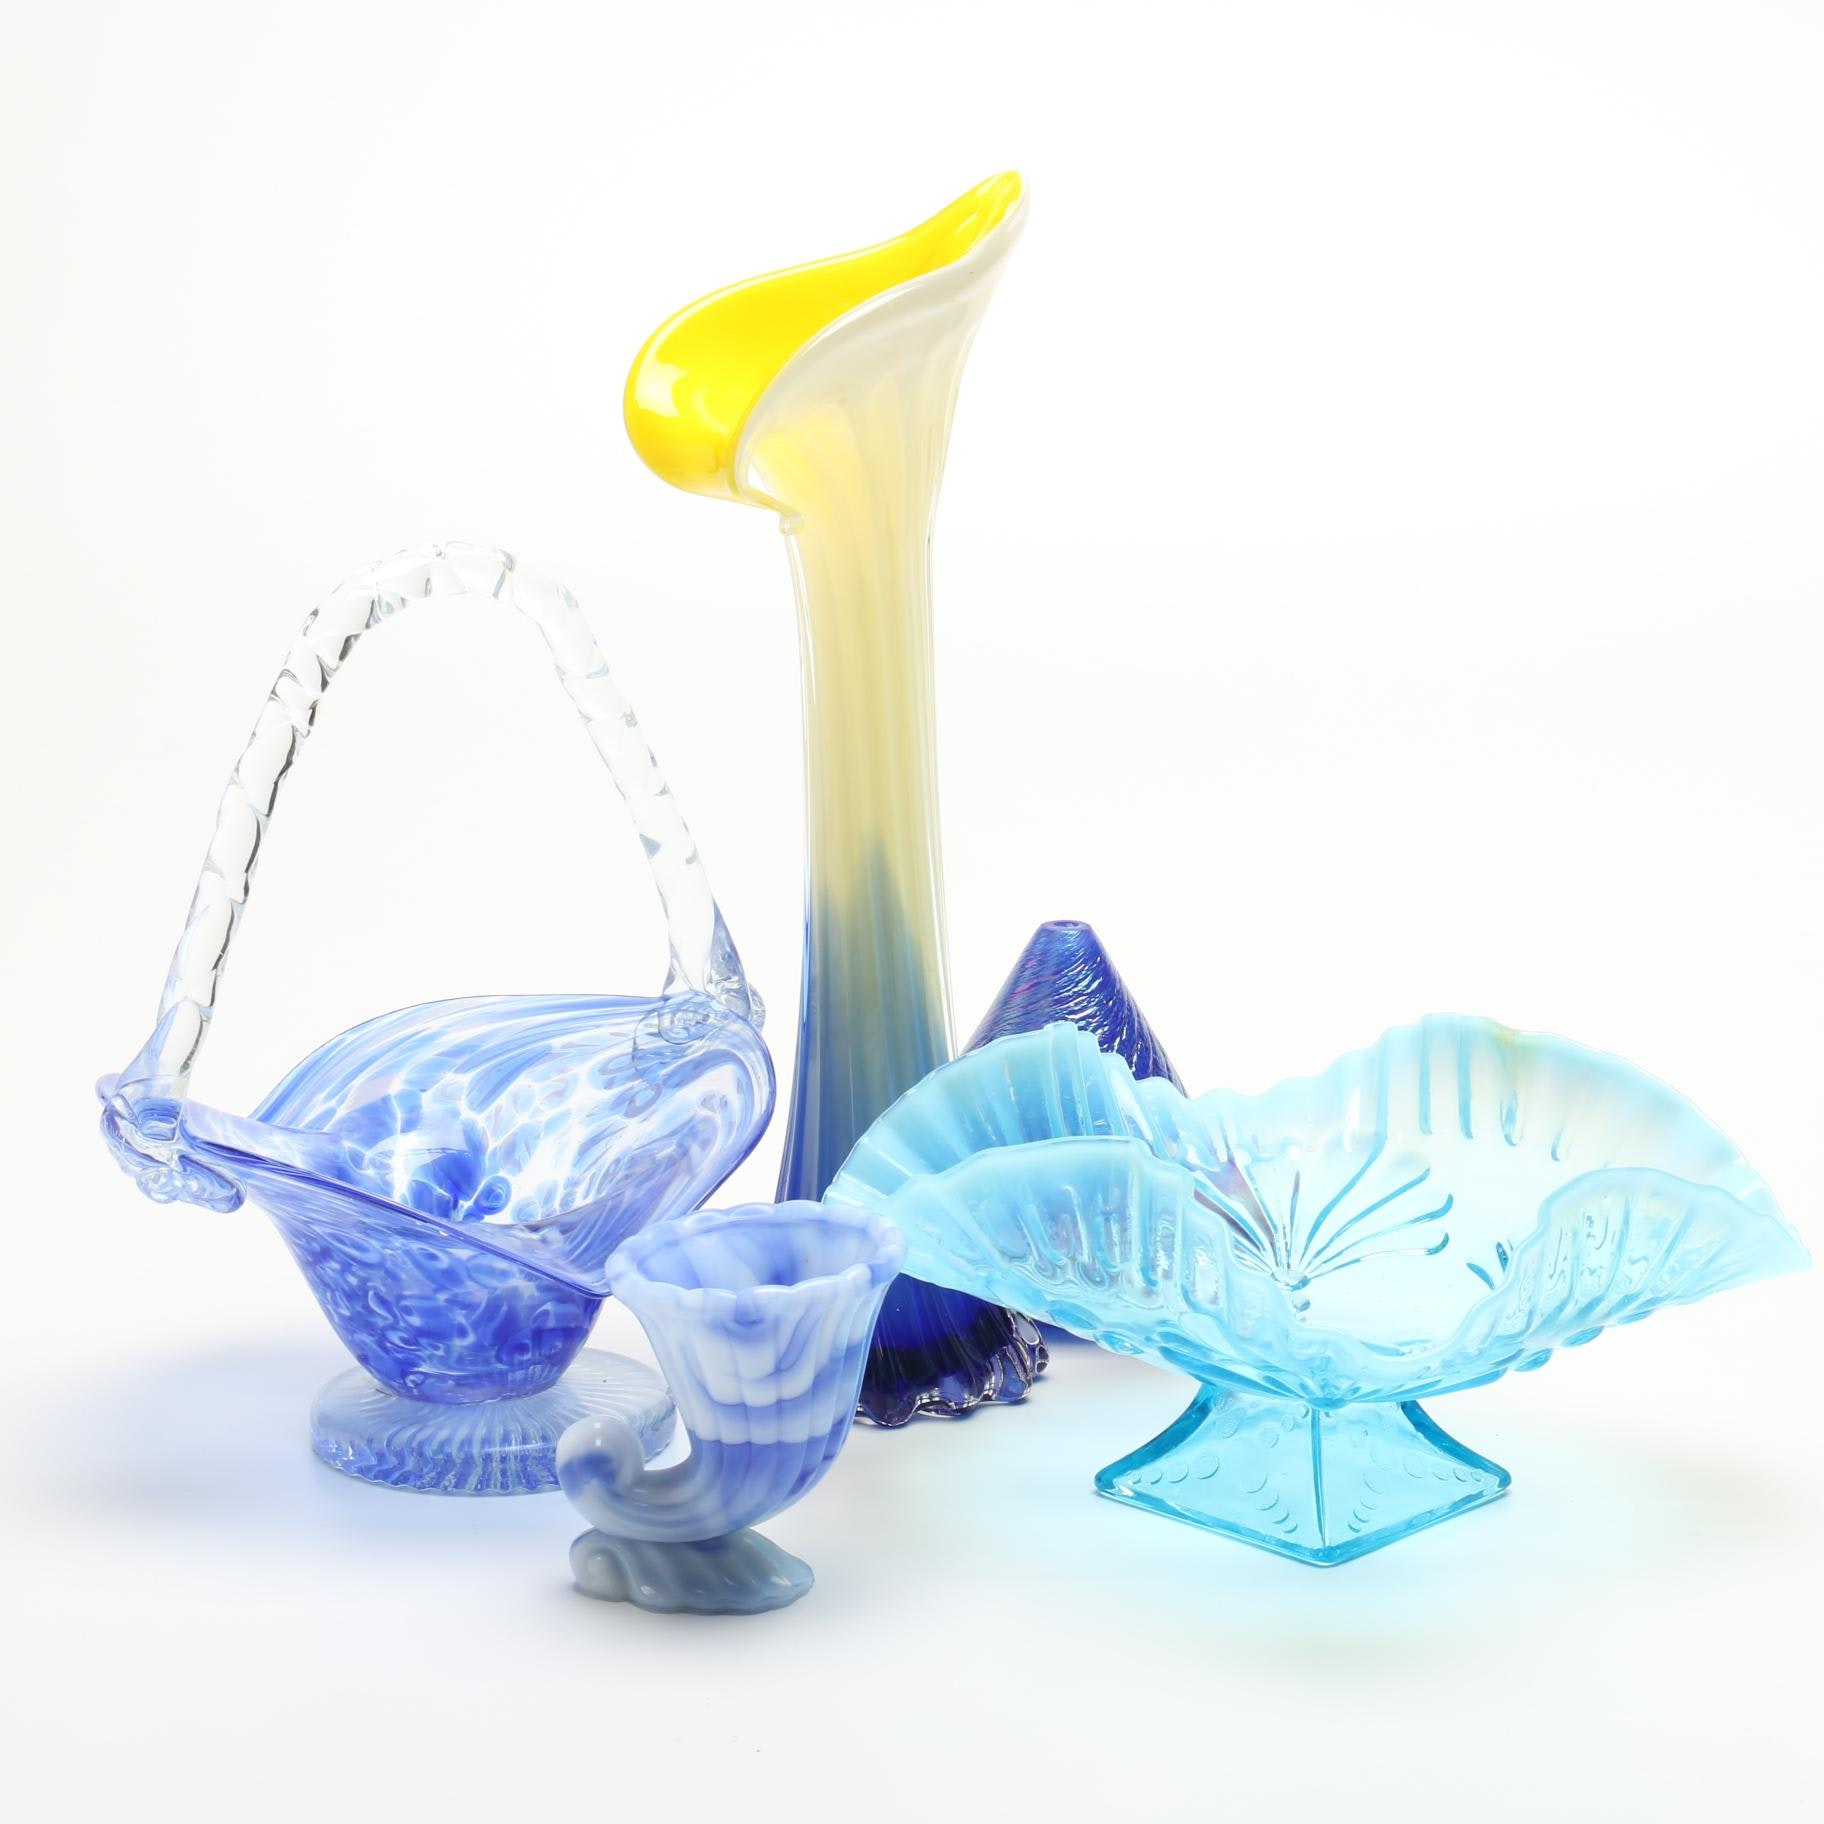 Decorative Glassware in Shades of Blue